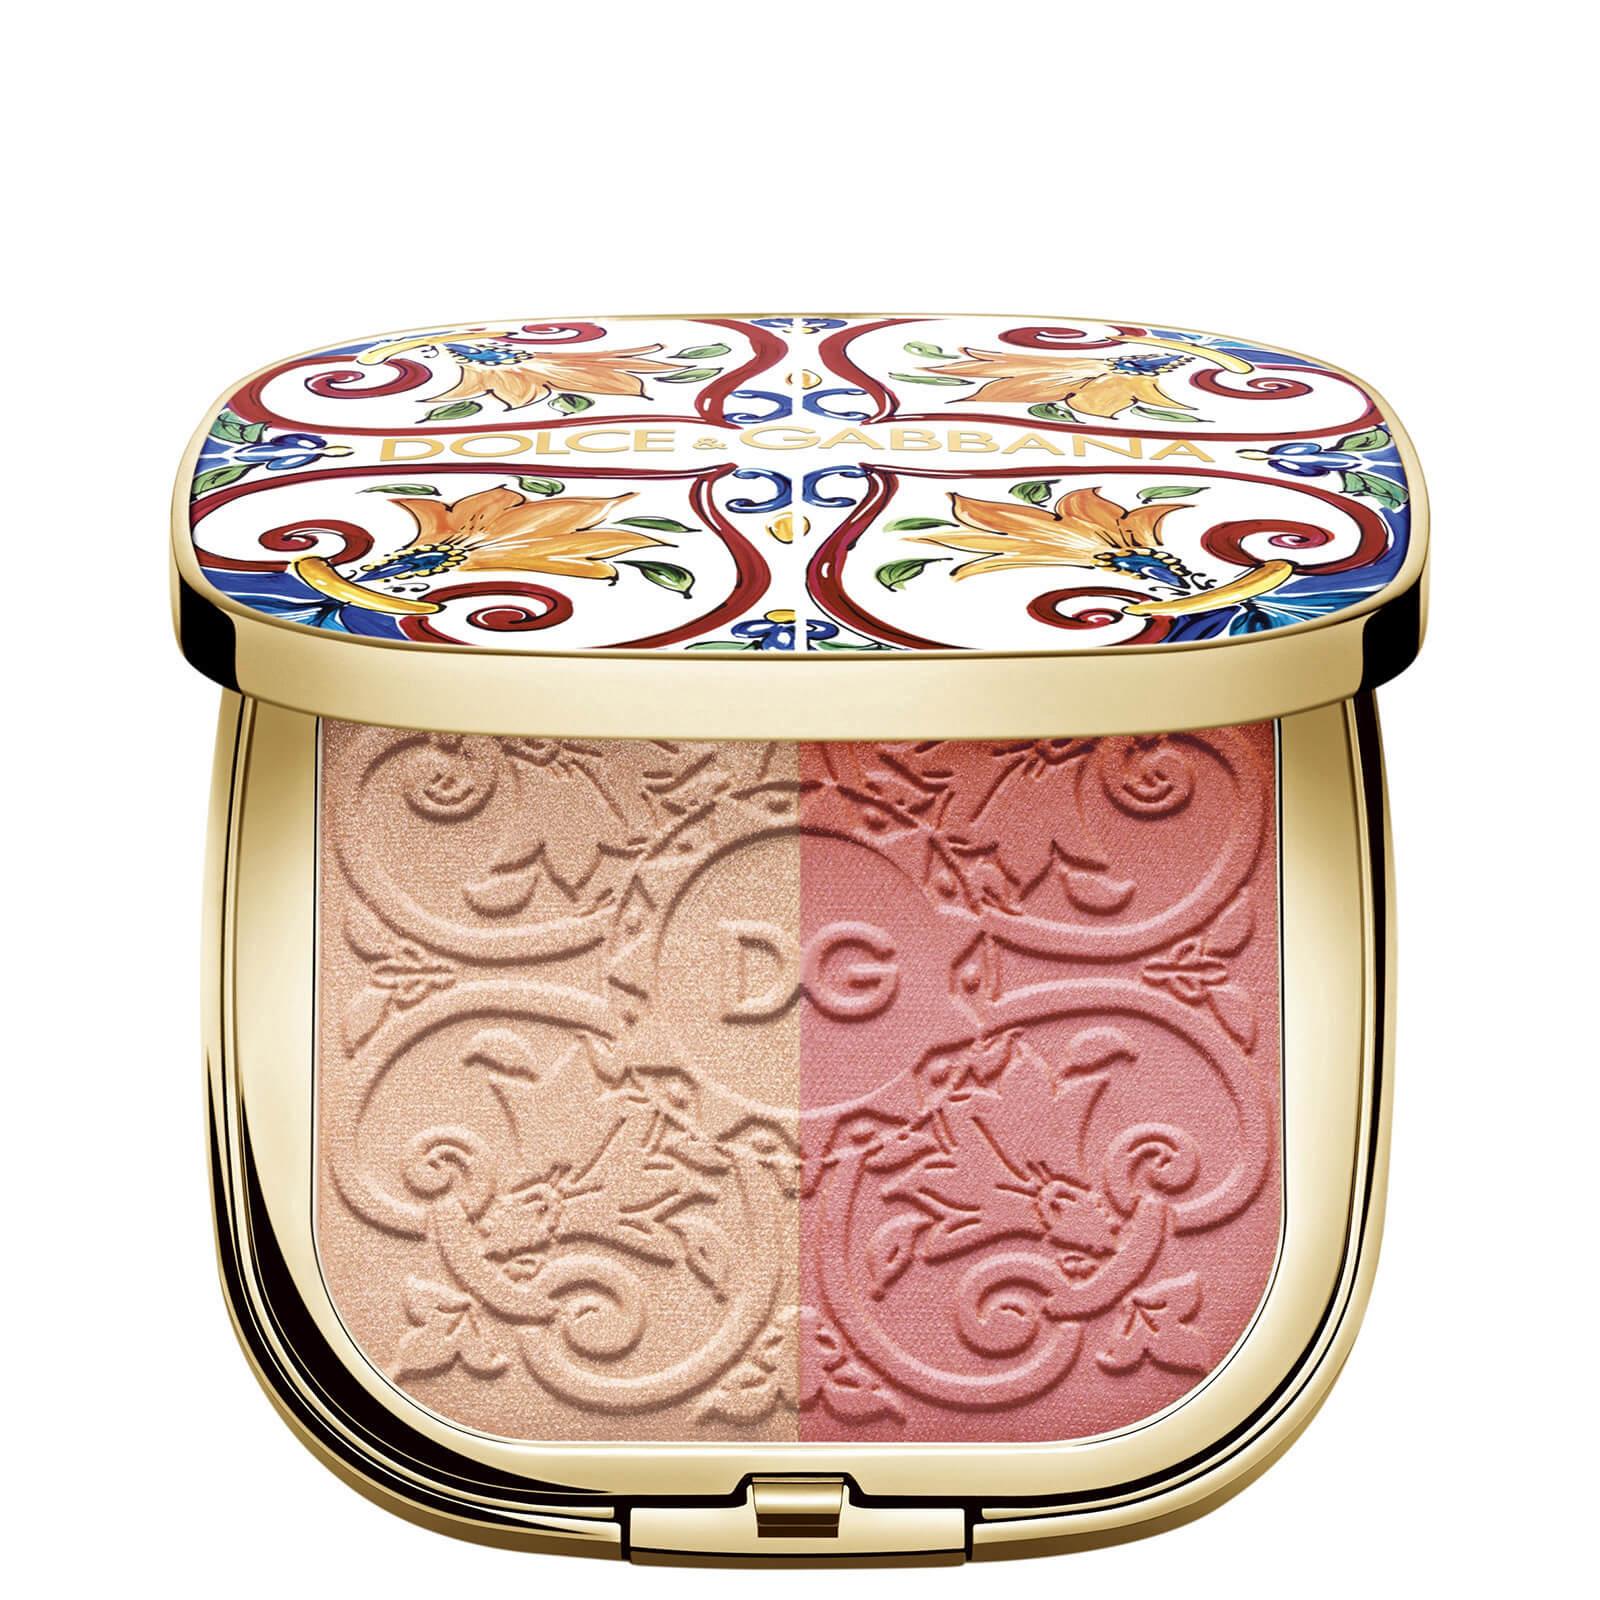 Купить Dolce&Gabbana Solar Glow Illuminating Duo - Peach Blossom 2